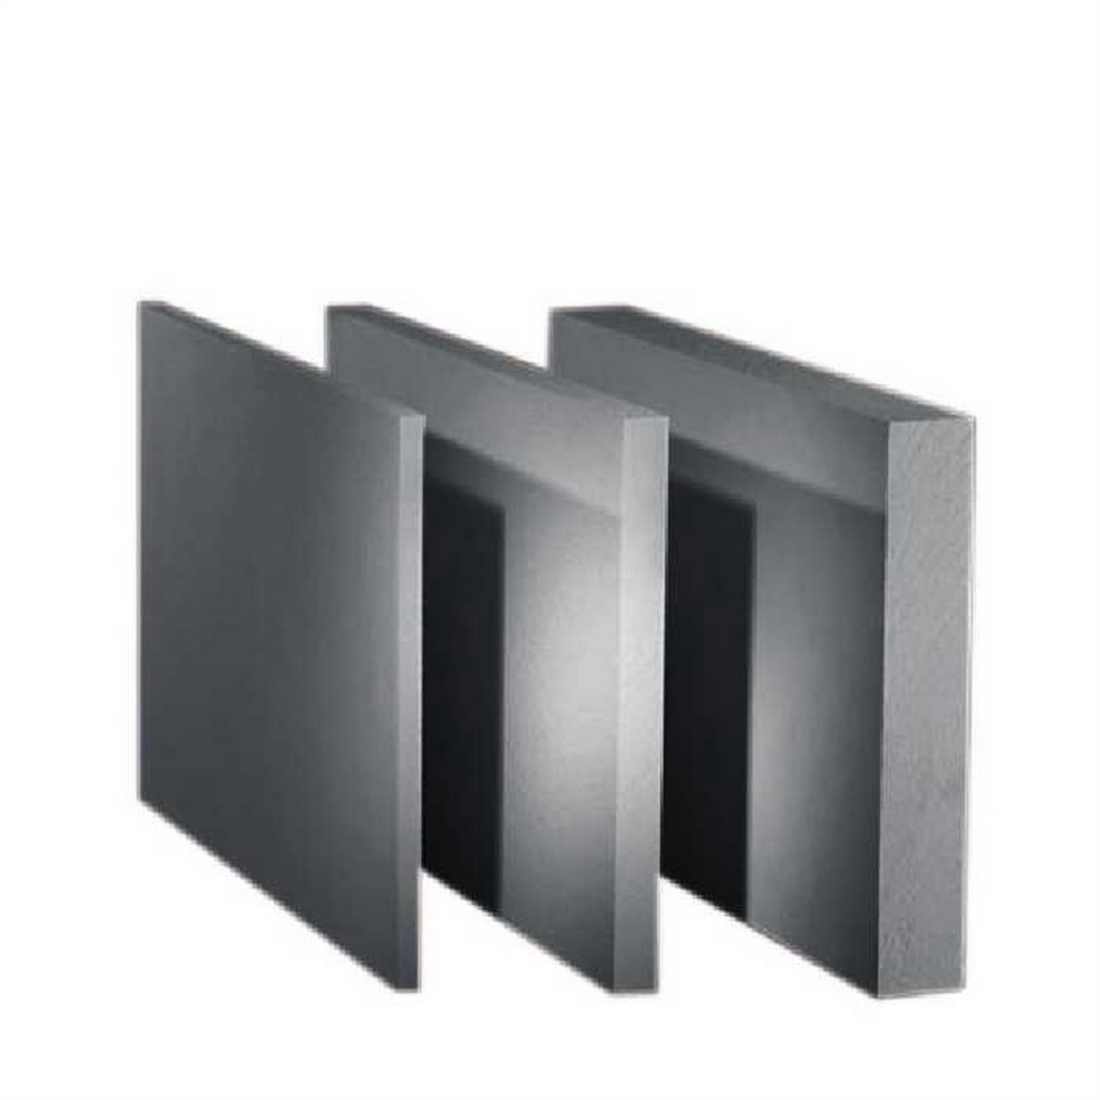 Expol Platinum Board 2400 x 1200 x 100mm R3.13 Black Expanded Polystyrene N2499